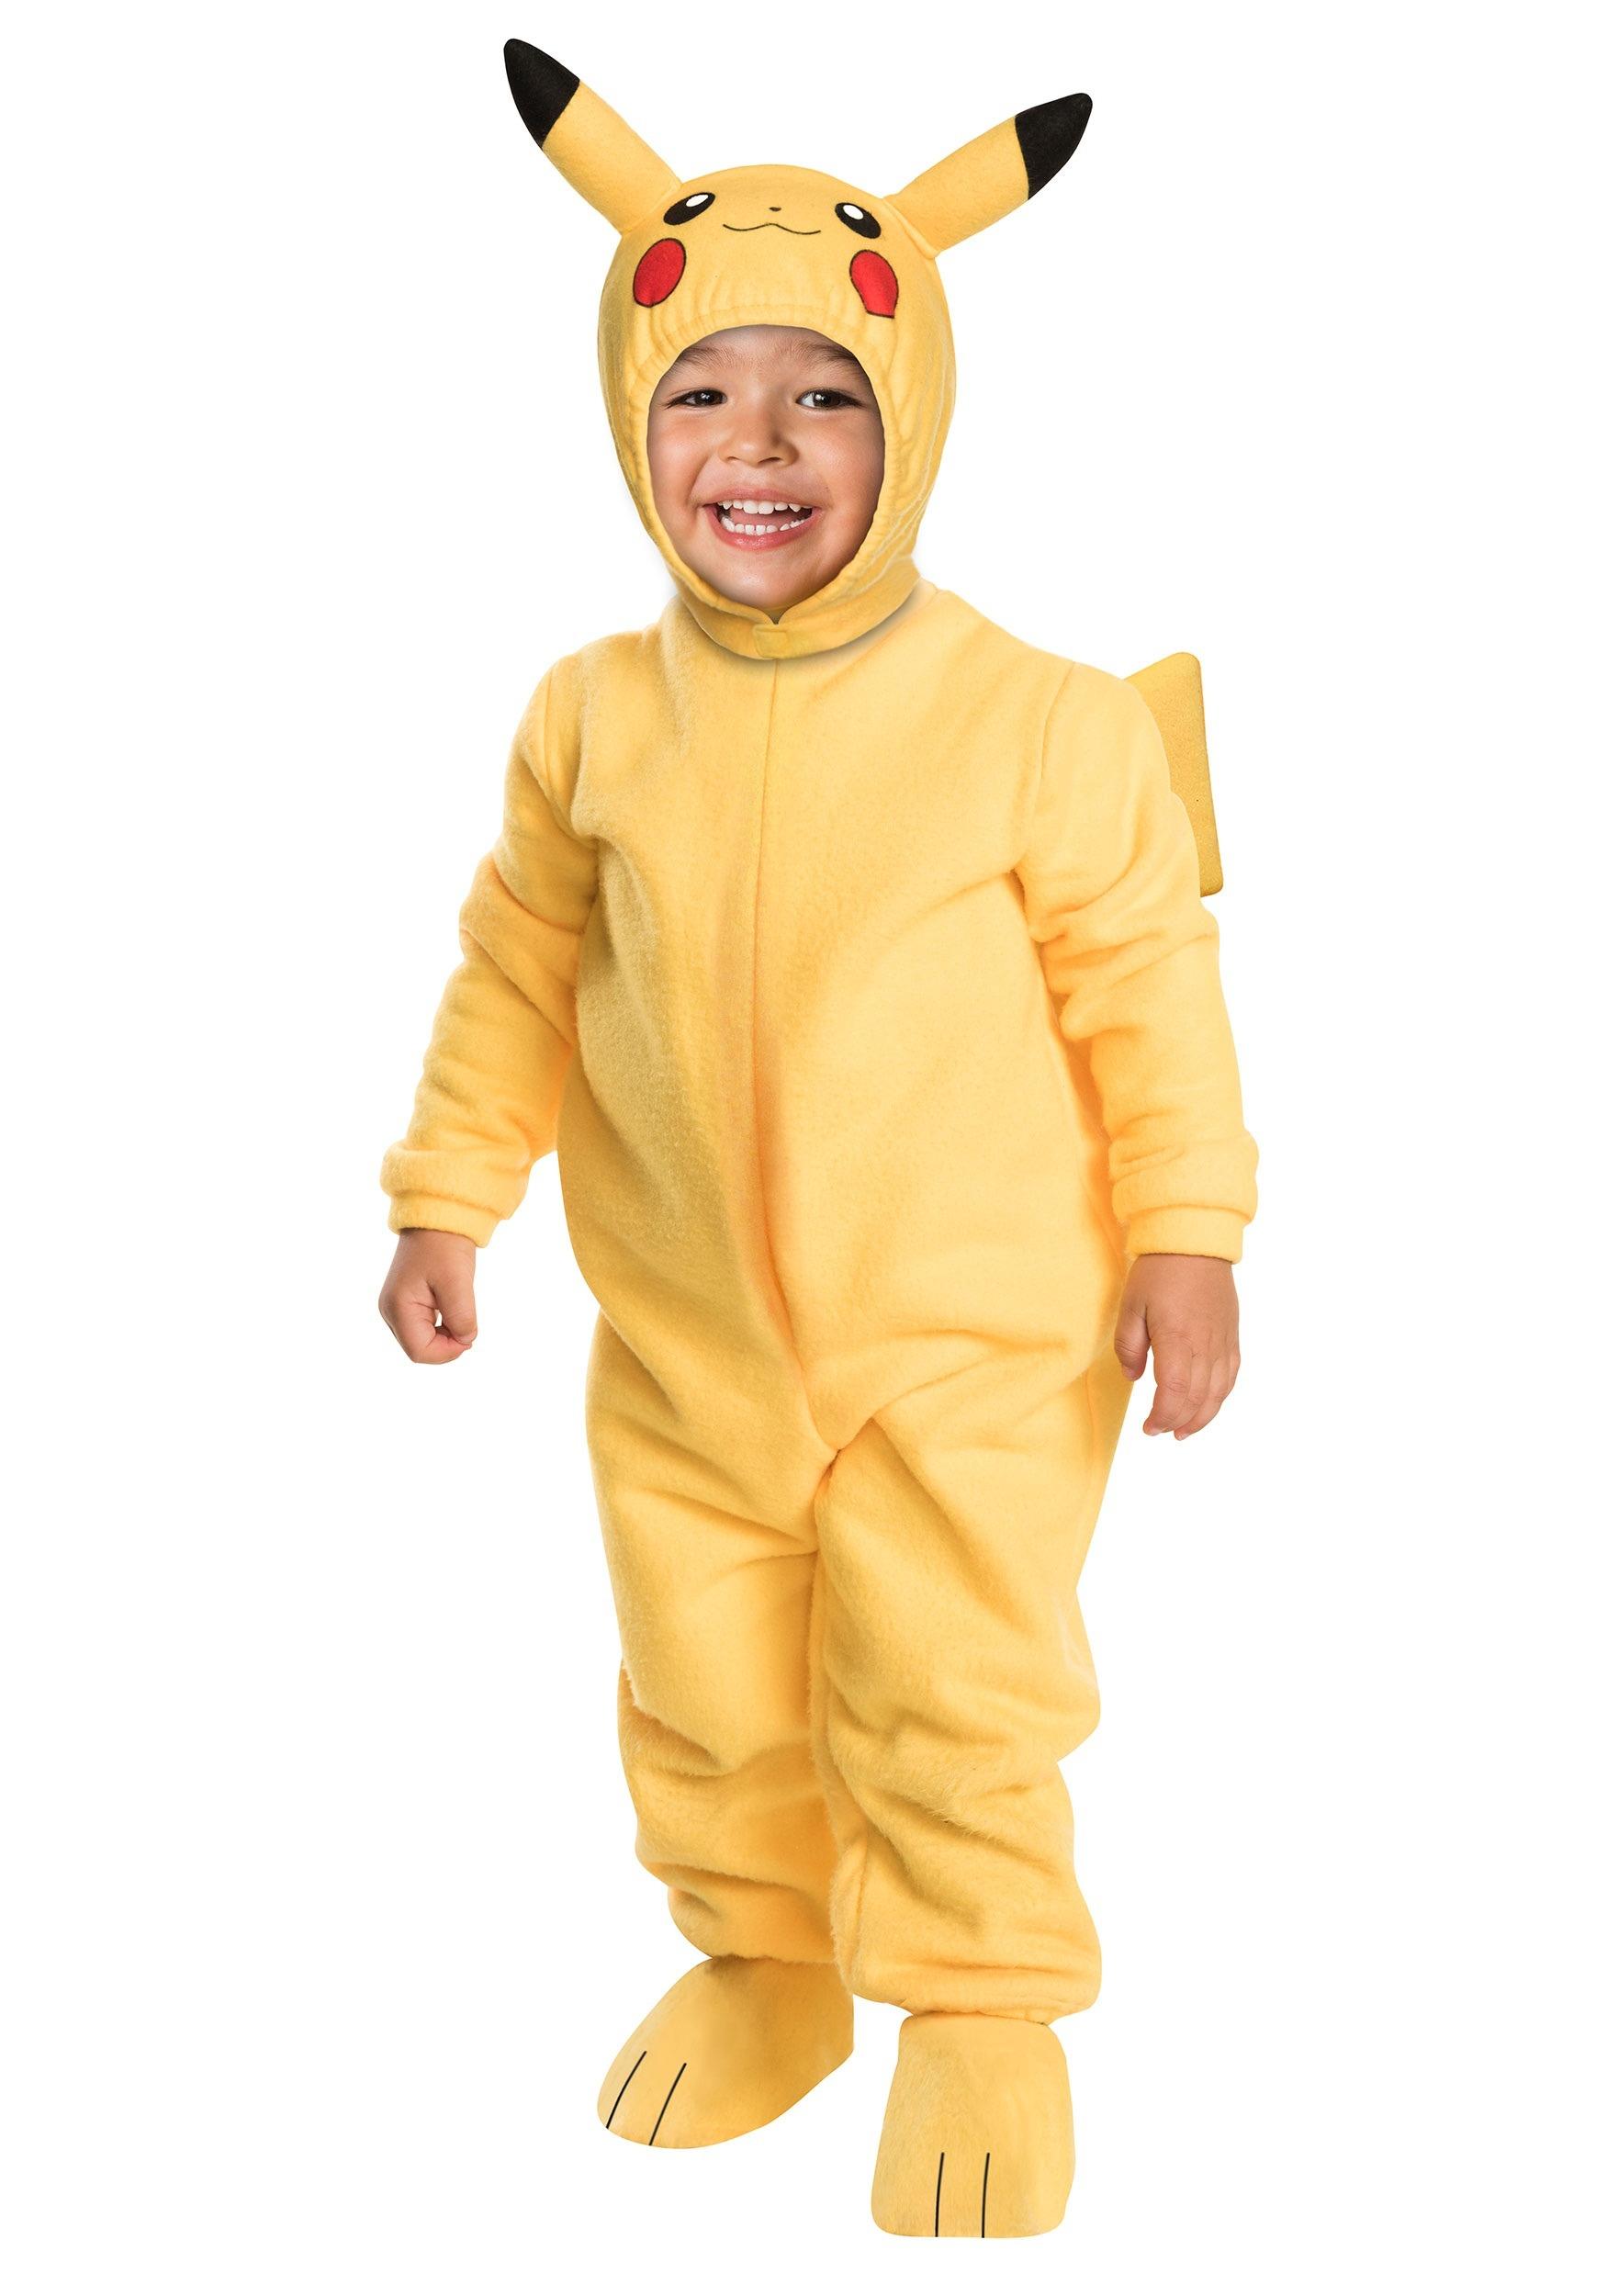 Toddler Deluxe Pikachu Costume RU510166